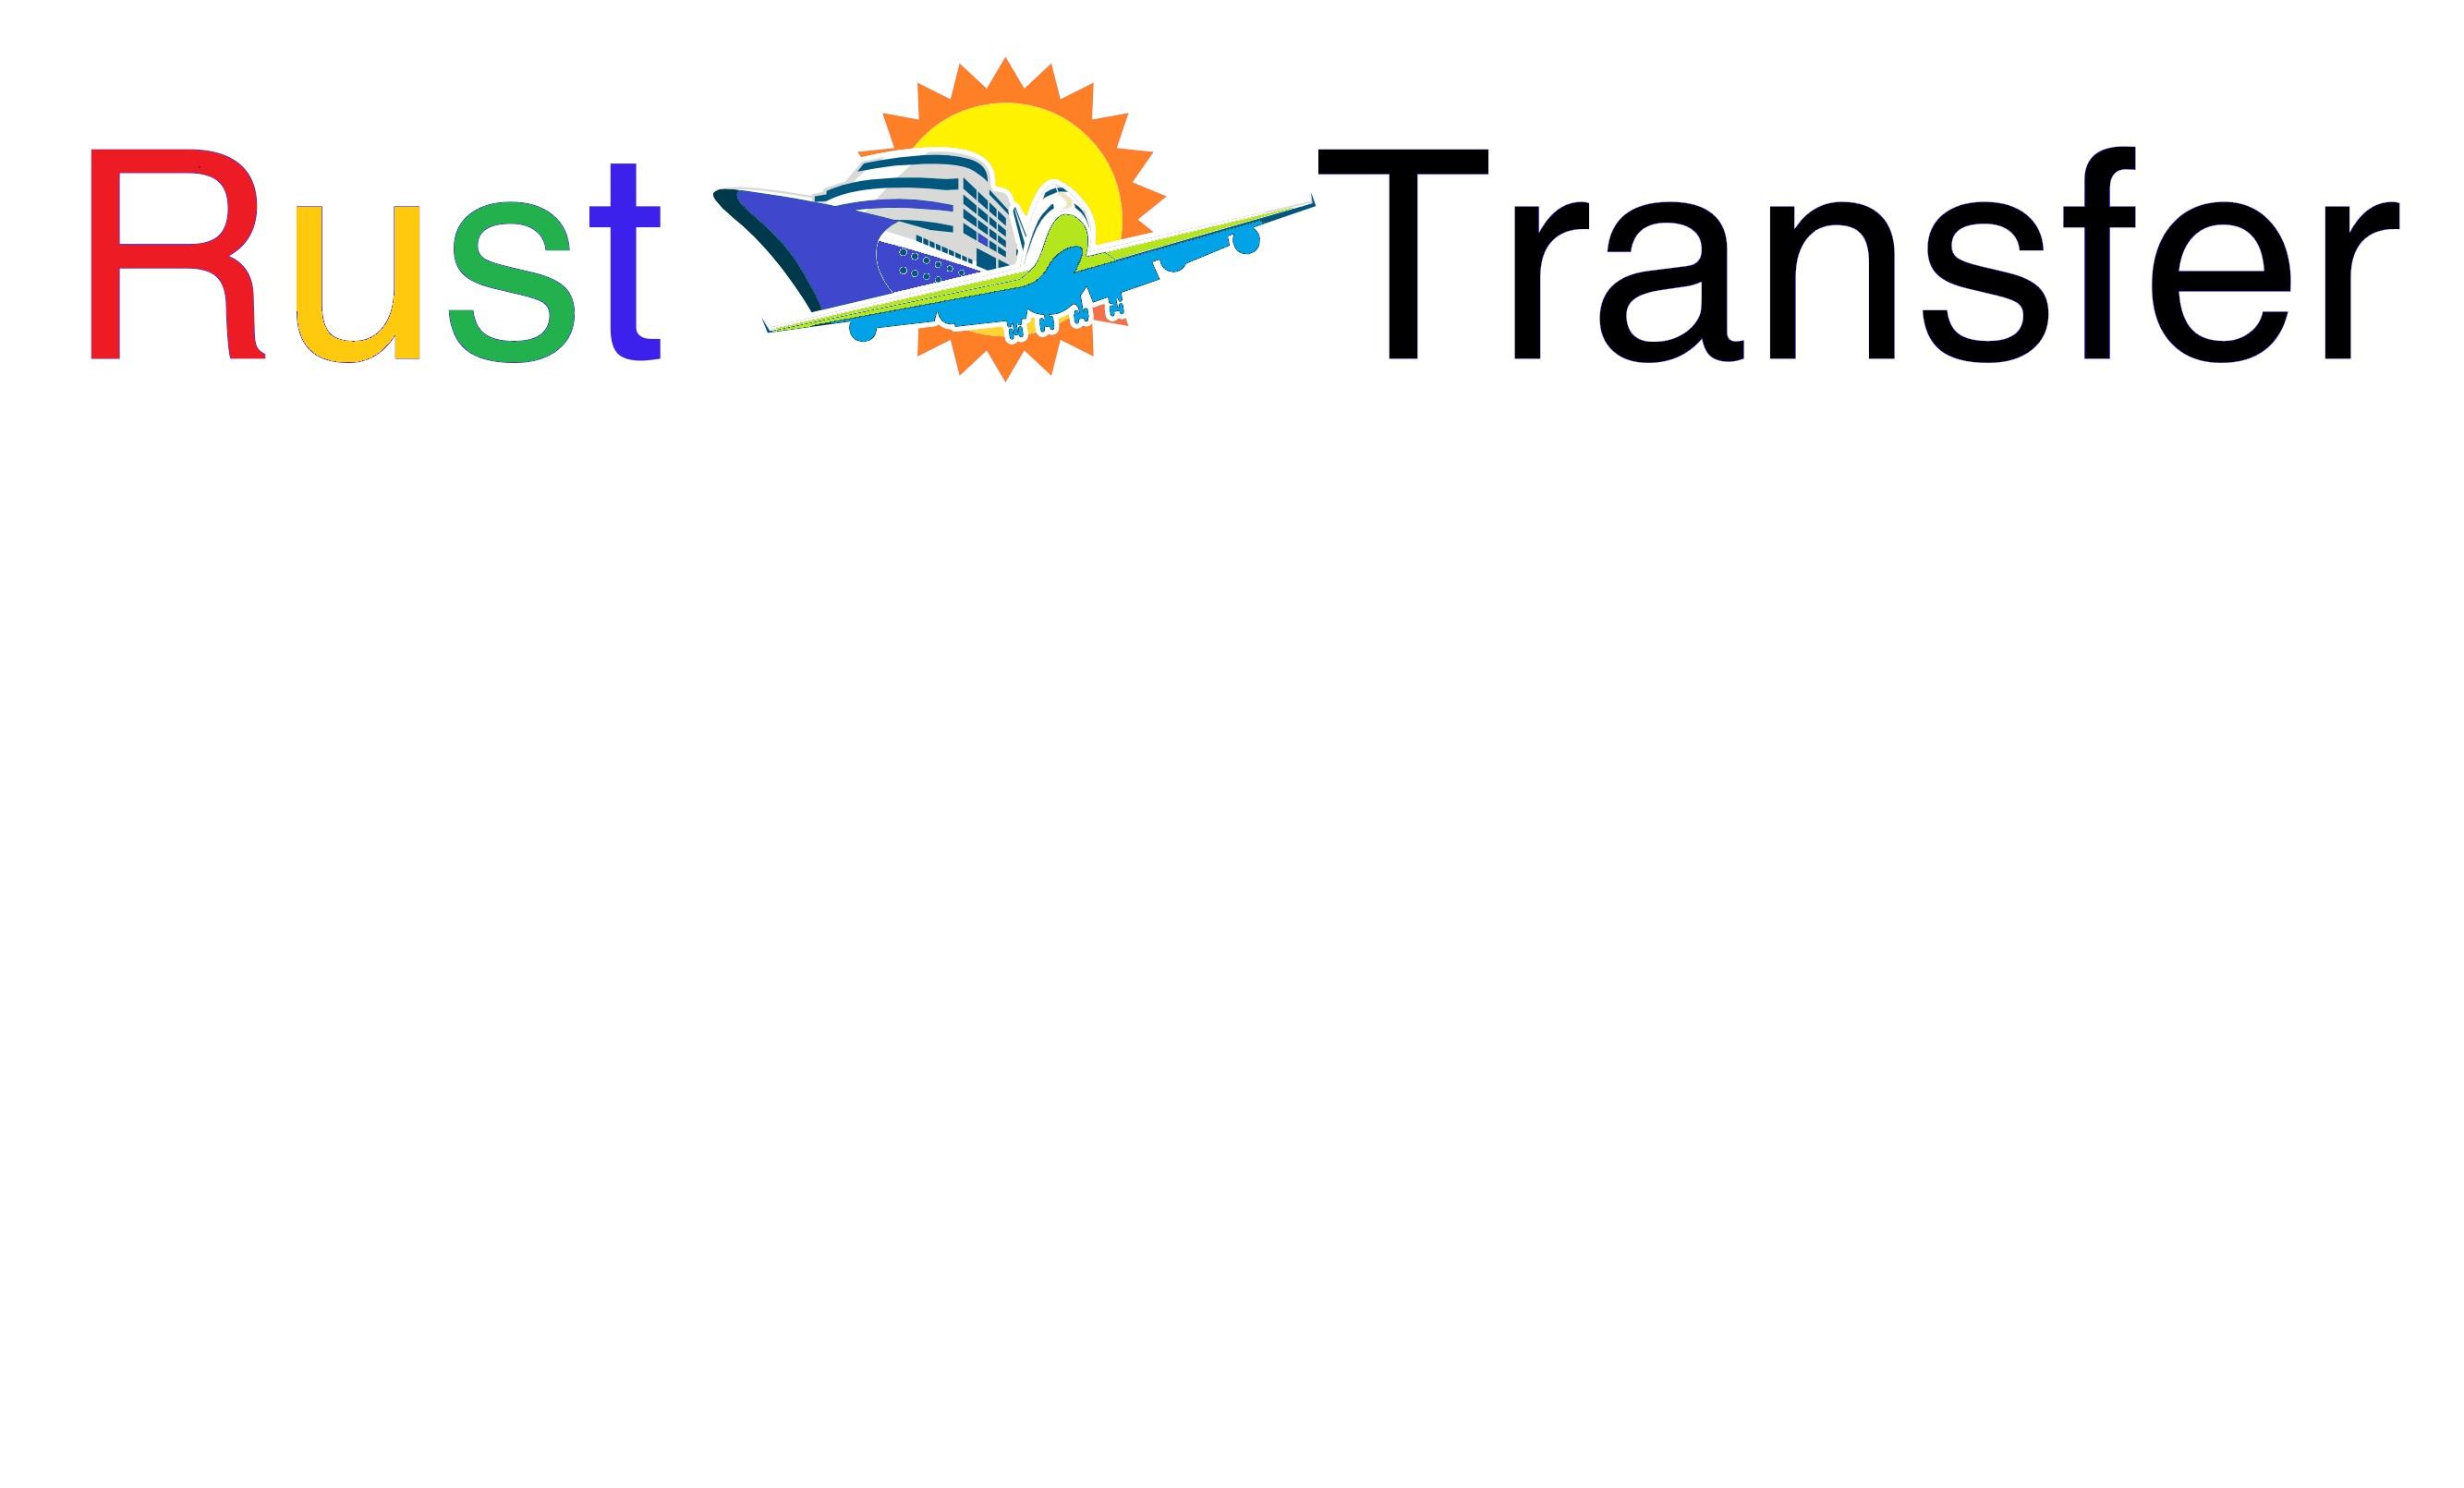 Rust-Transfer